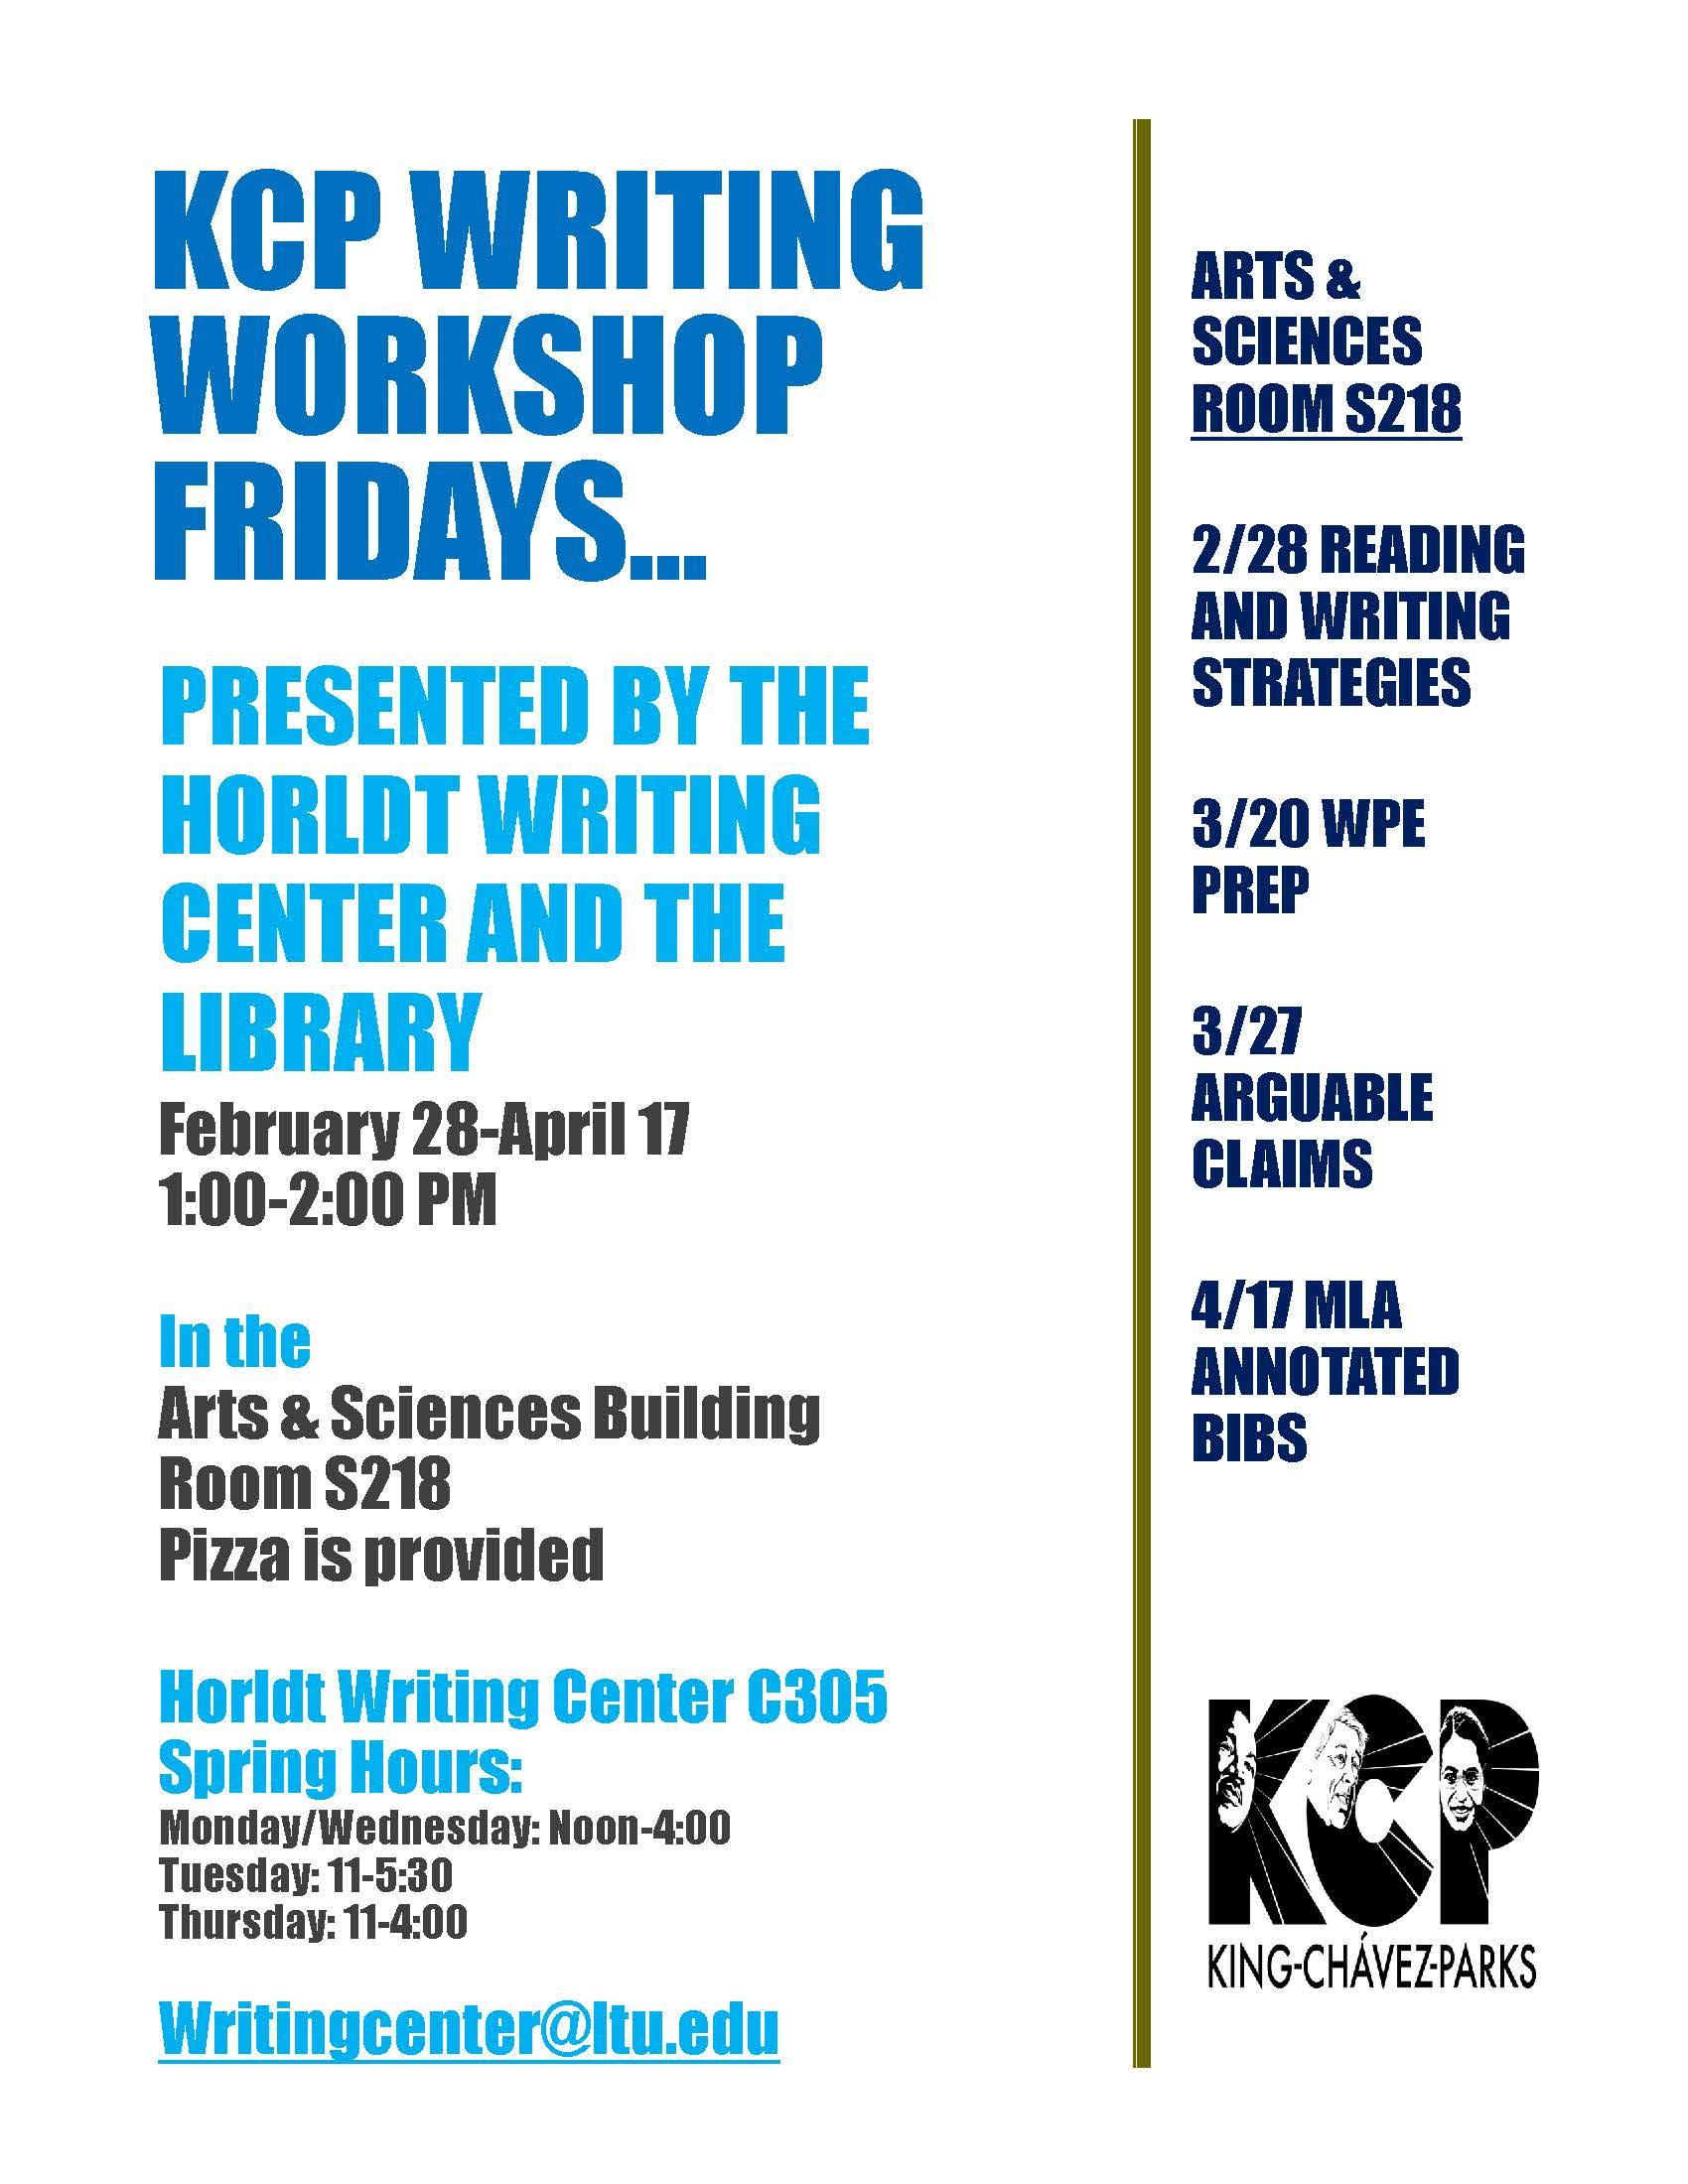 KCP Writing Workshop Fridays